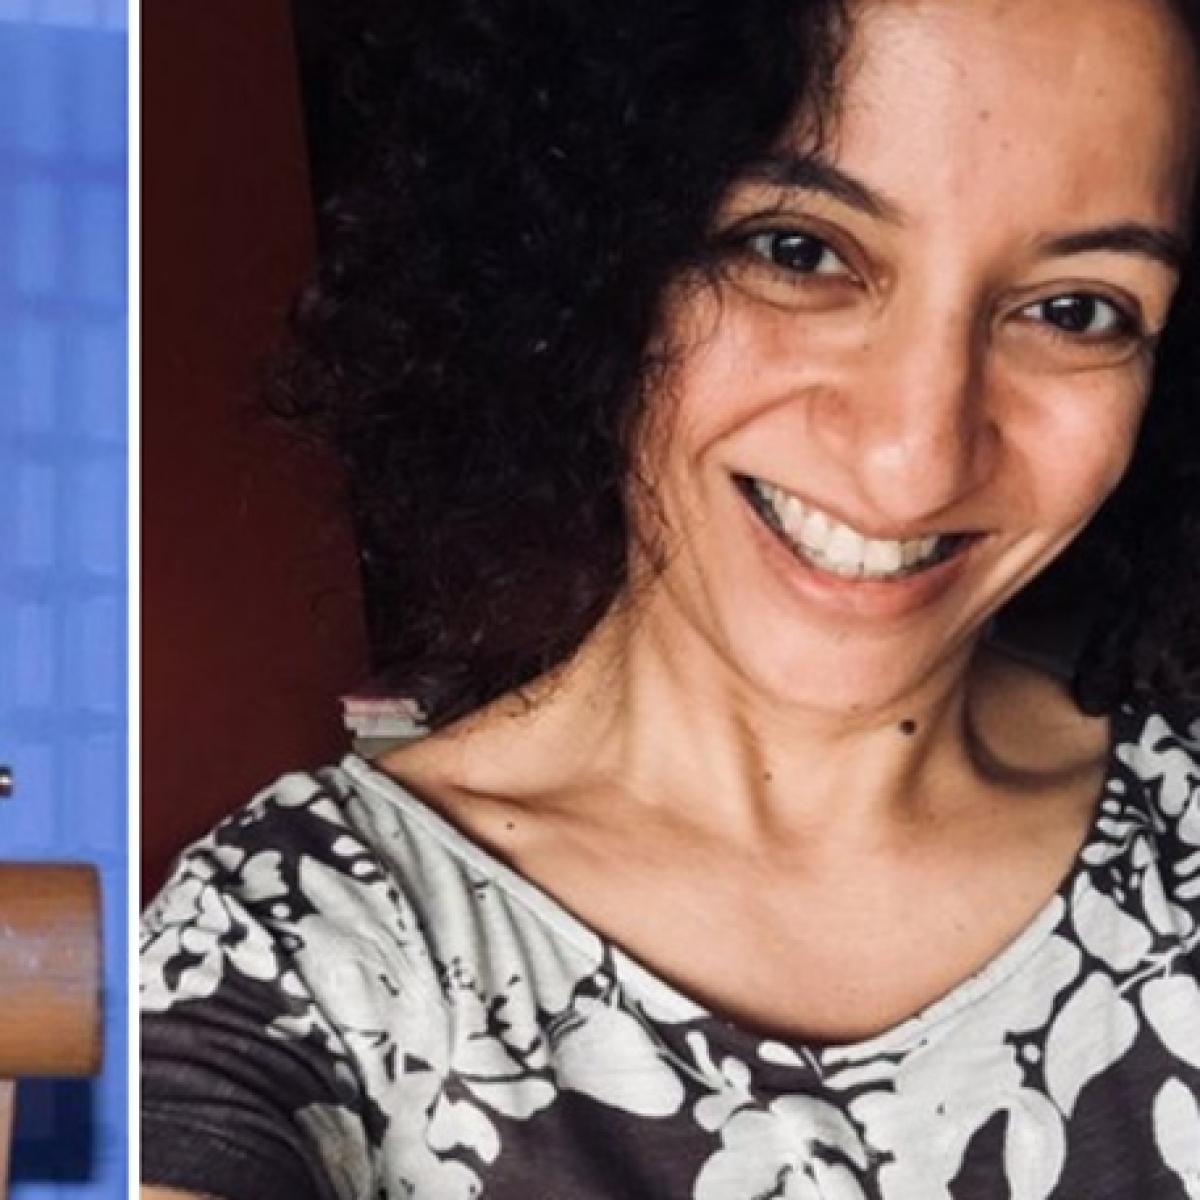 #MeToo: Delhi Court acquits Priya Ramani in MJ Akbar's defamation case